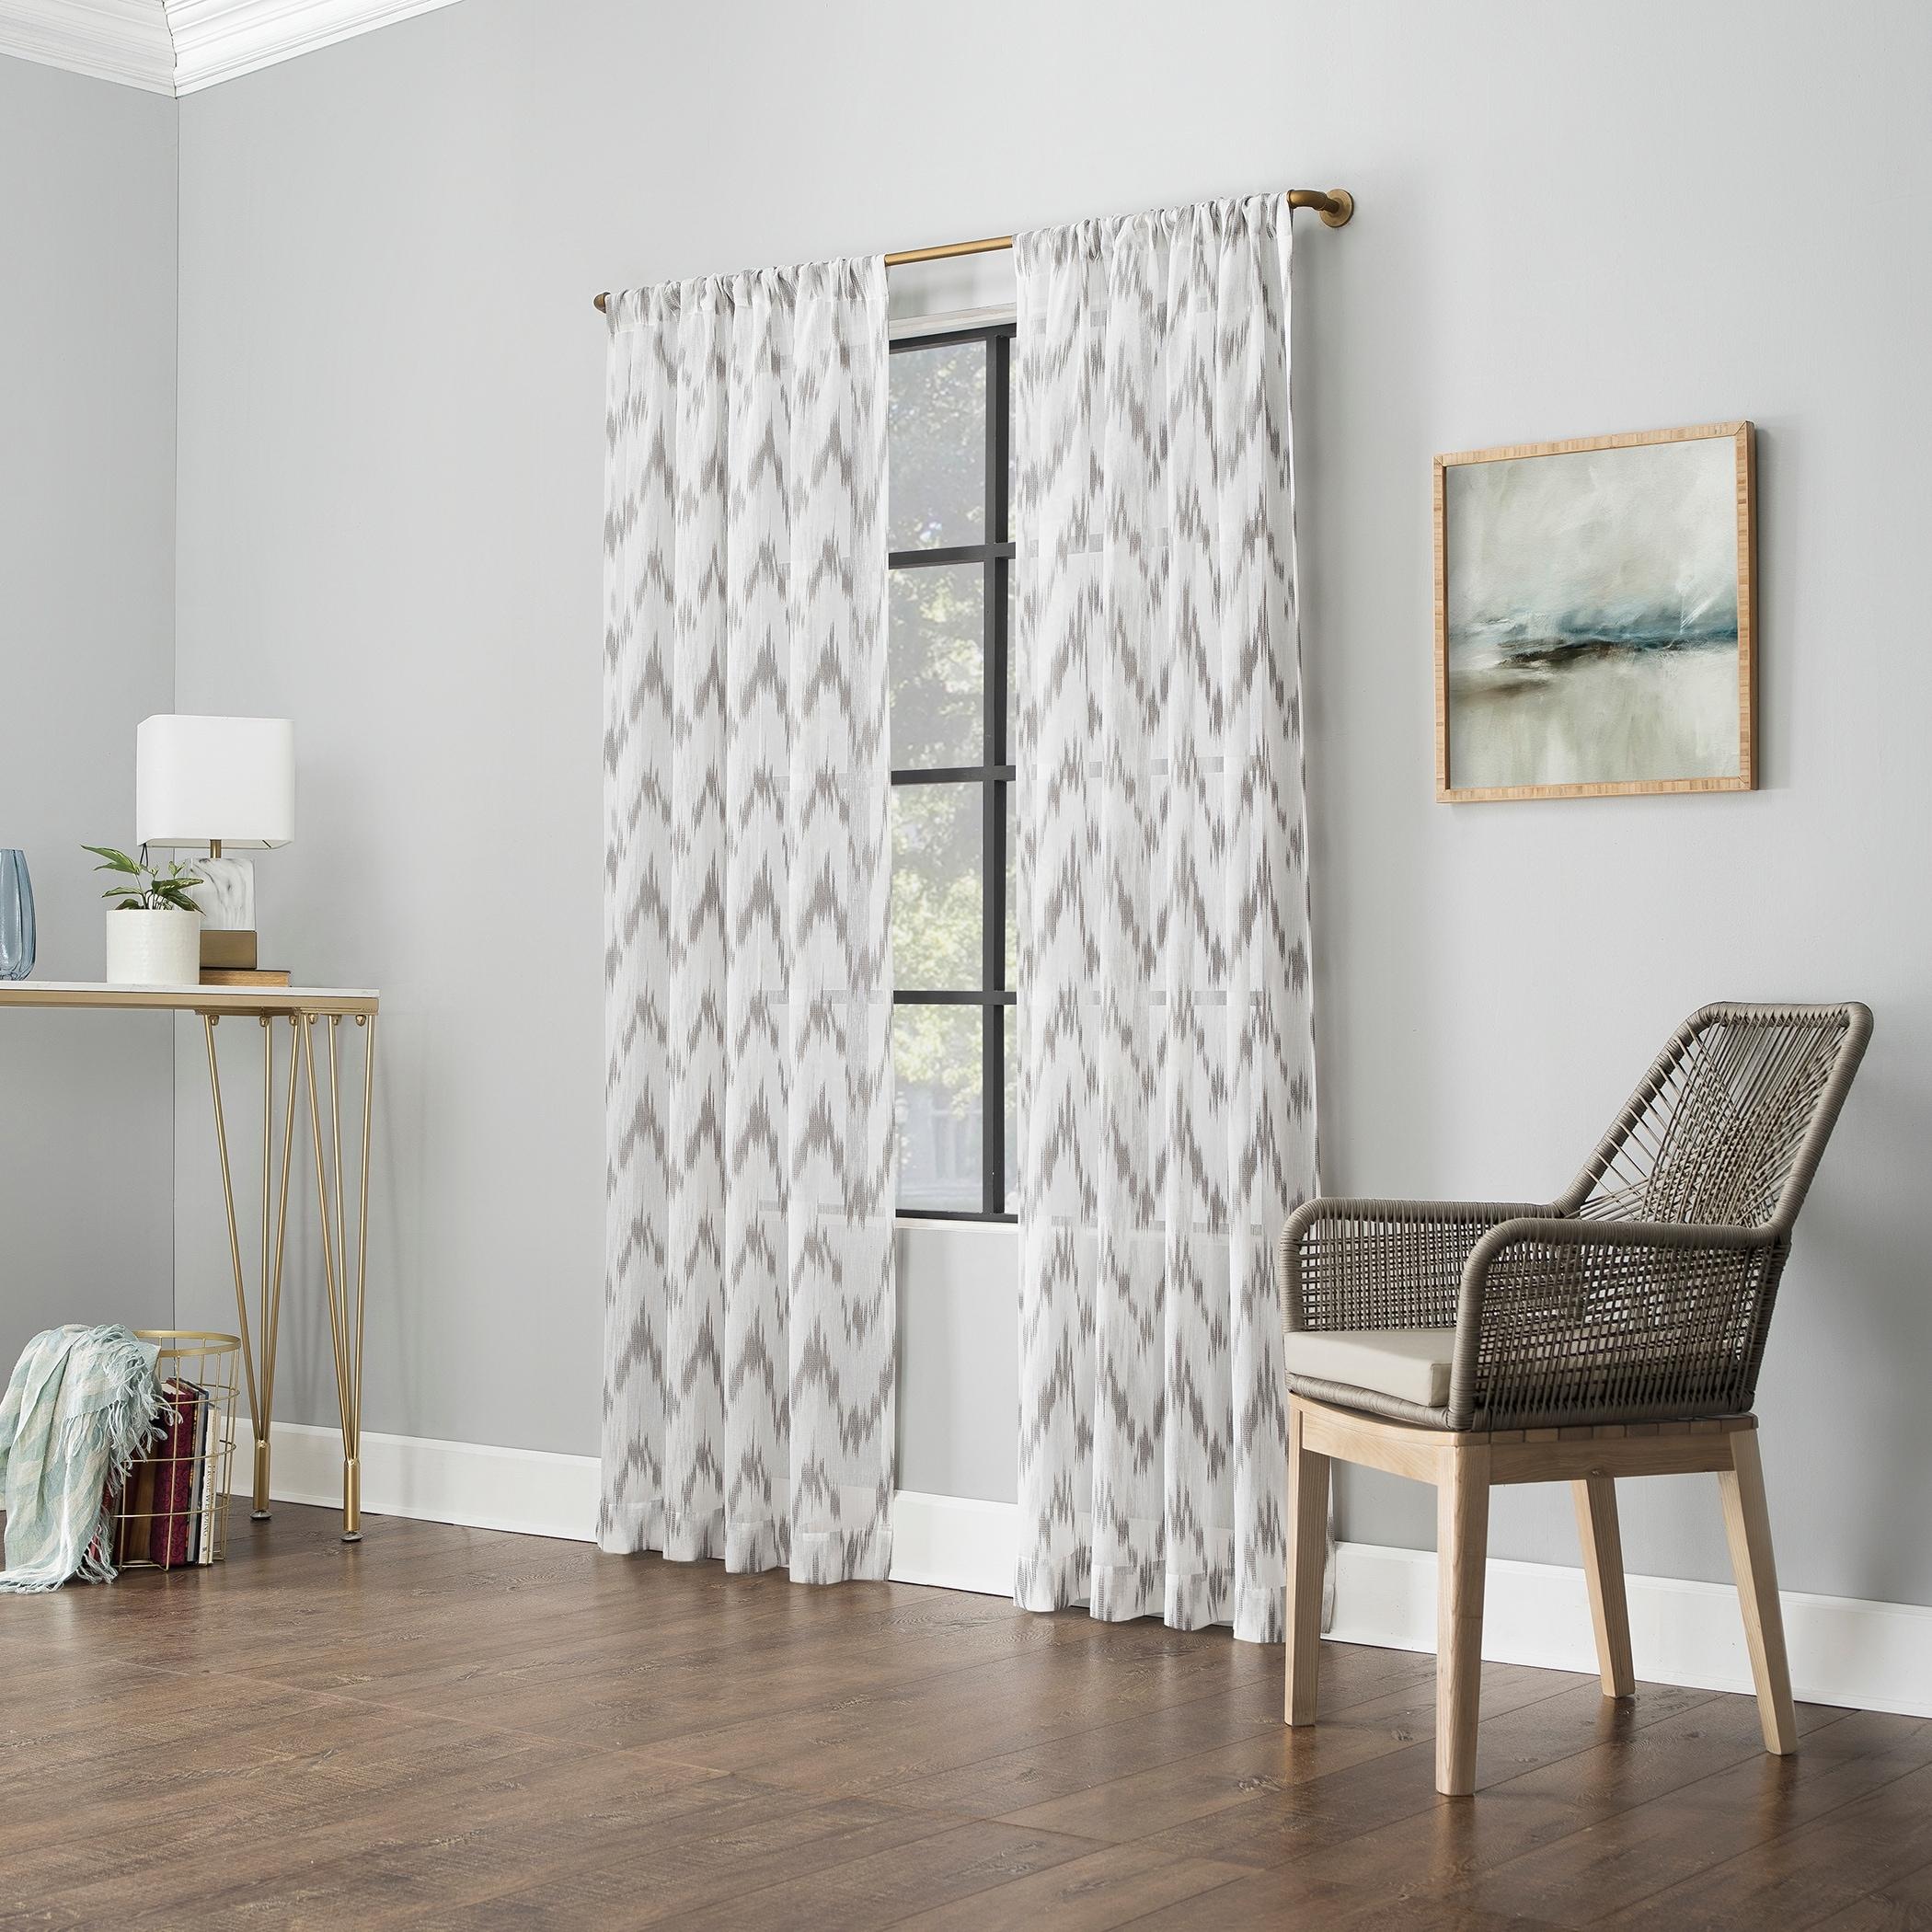 Scott Living Santo Ikat Print Textured Sheer Rod Pocket Curtain Panel Overstock 31283699